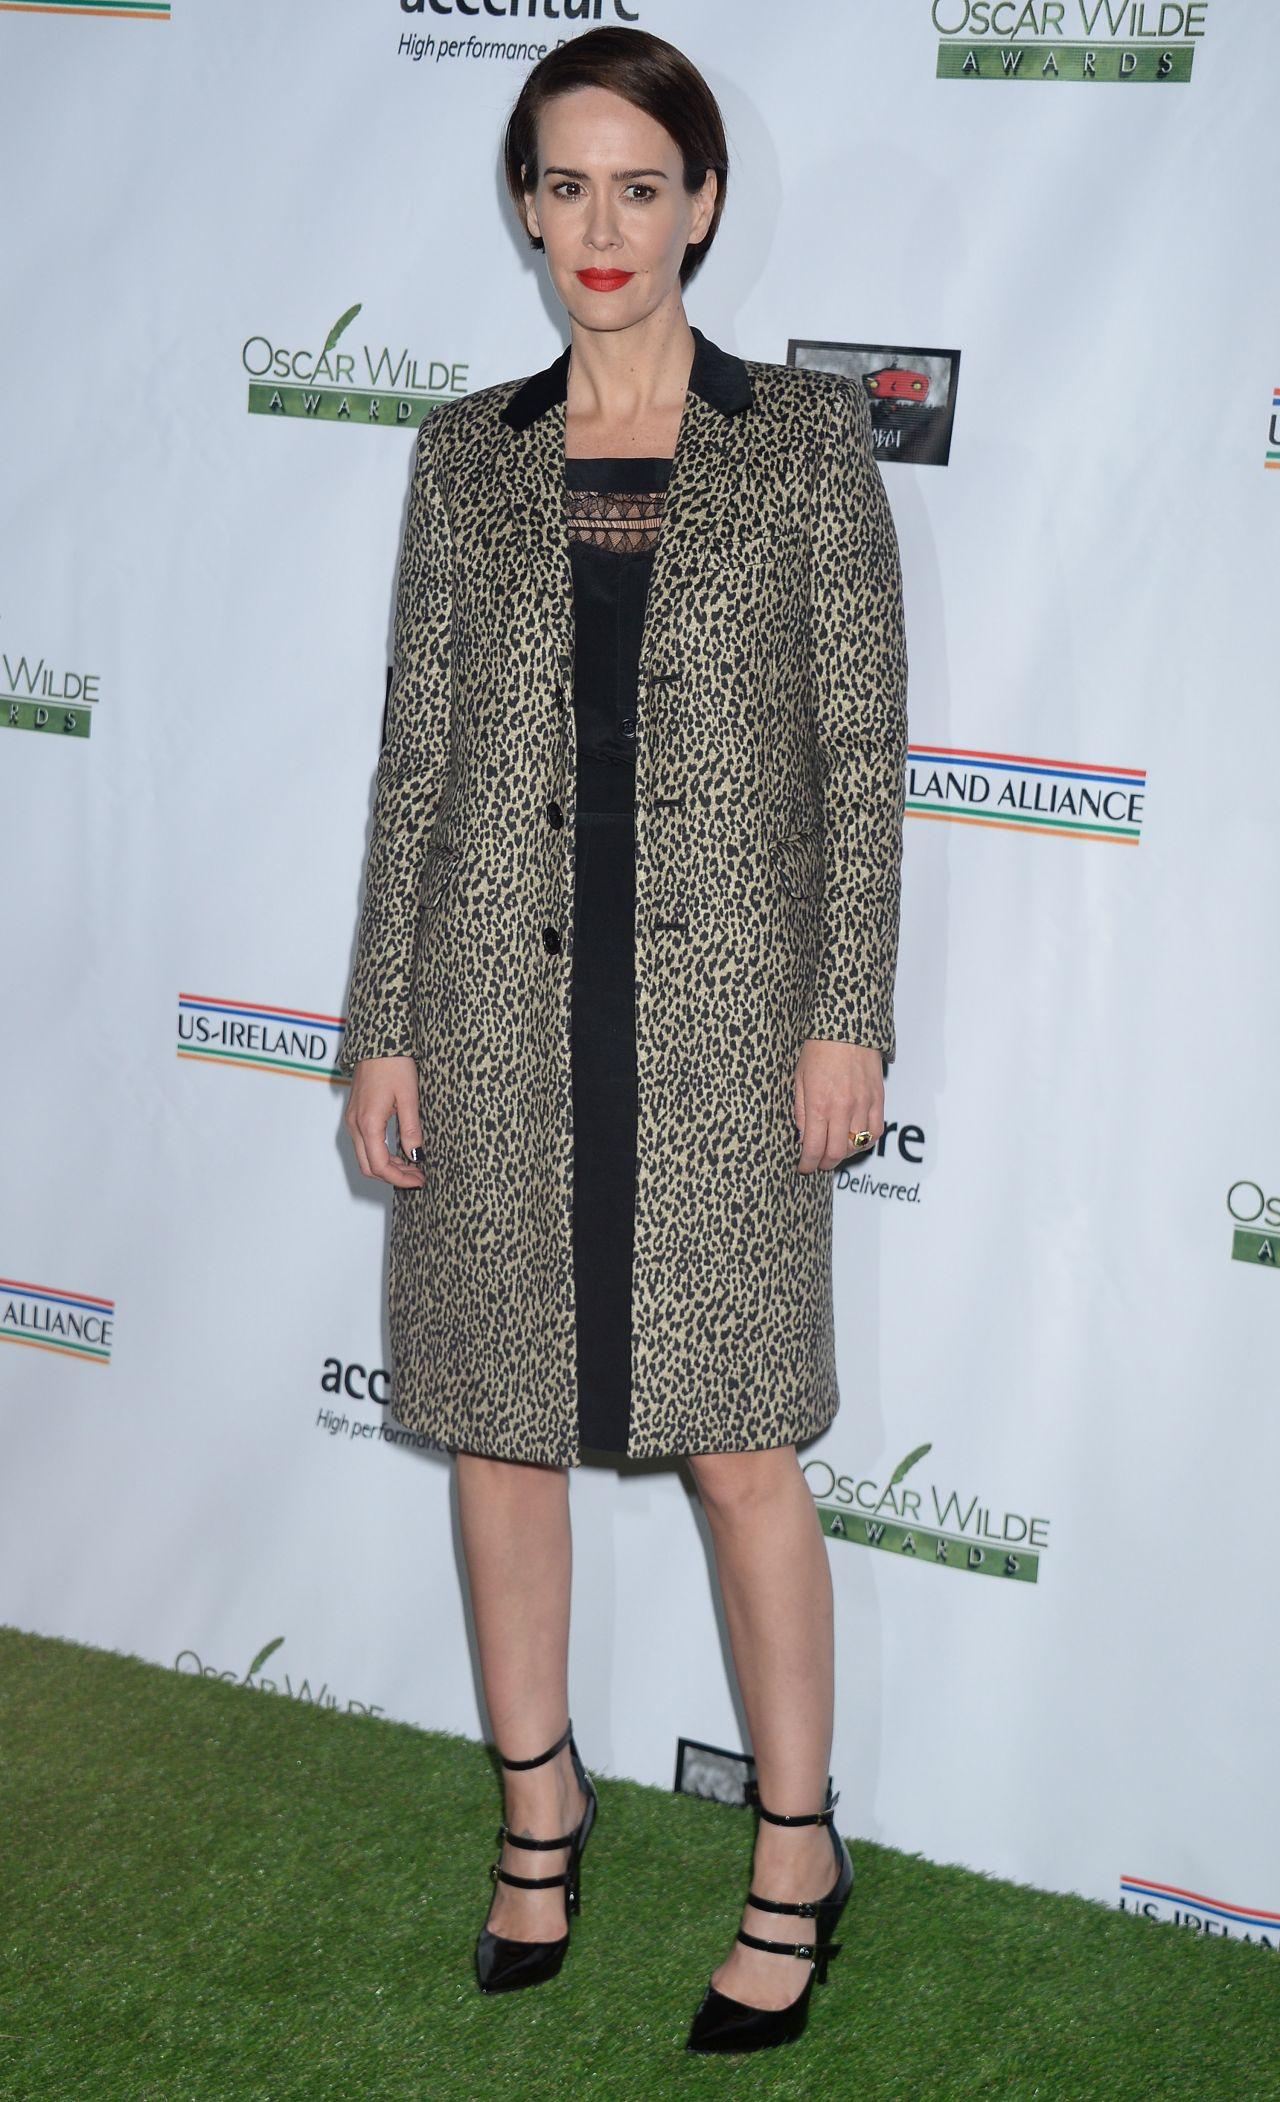 Sarah Paulson - 12th Annual Oscar Wilde Awards in Santa ...